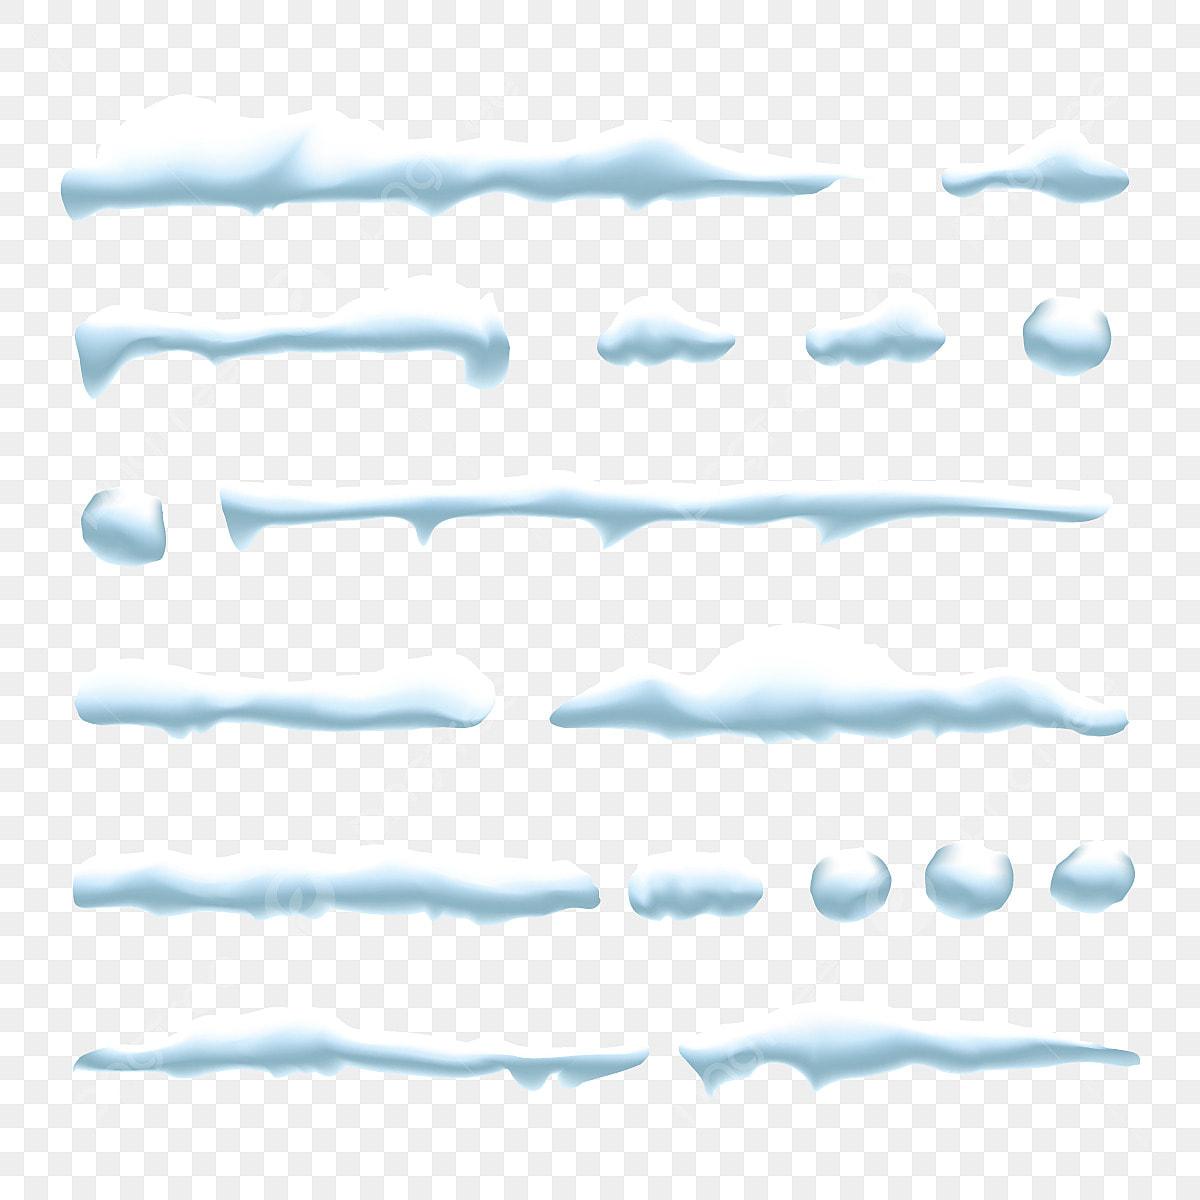 Get Untouched Snow, Vector Cut Files SVG